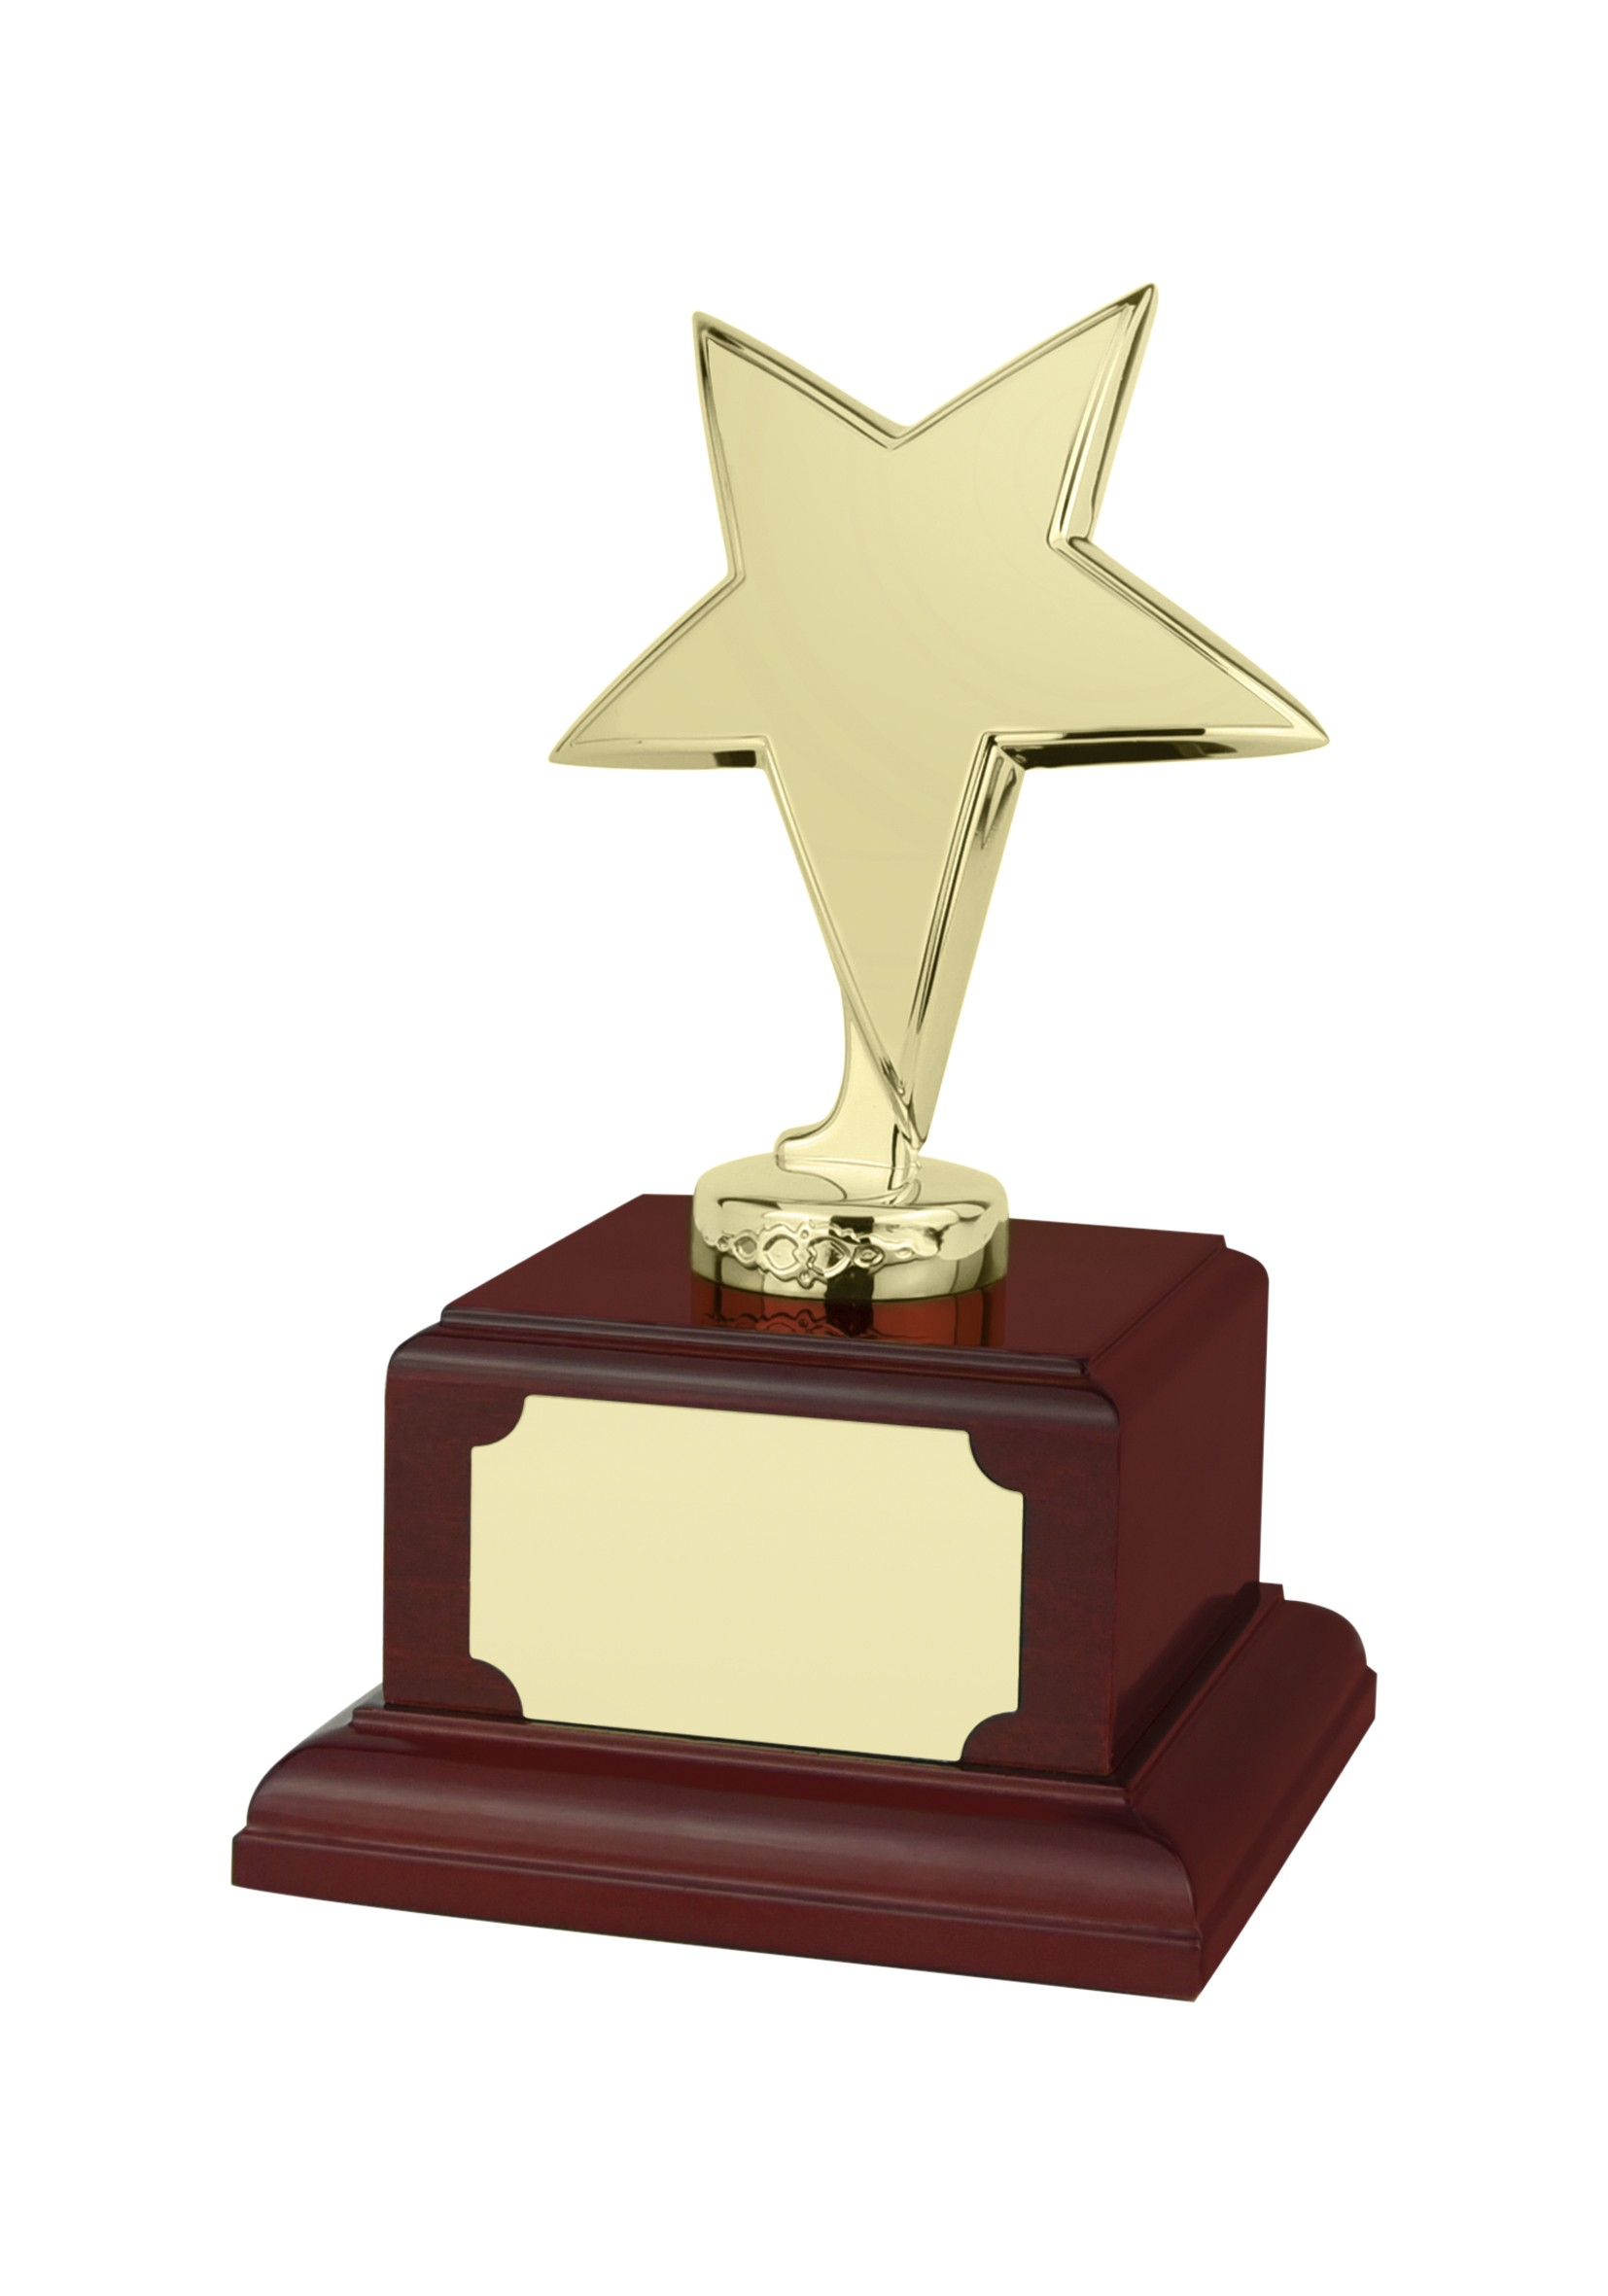 MB-EACH (P) 17.5cm Gold Finish Star Award